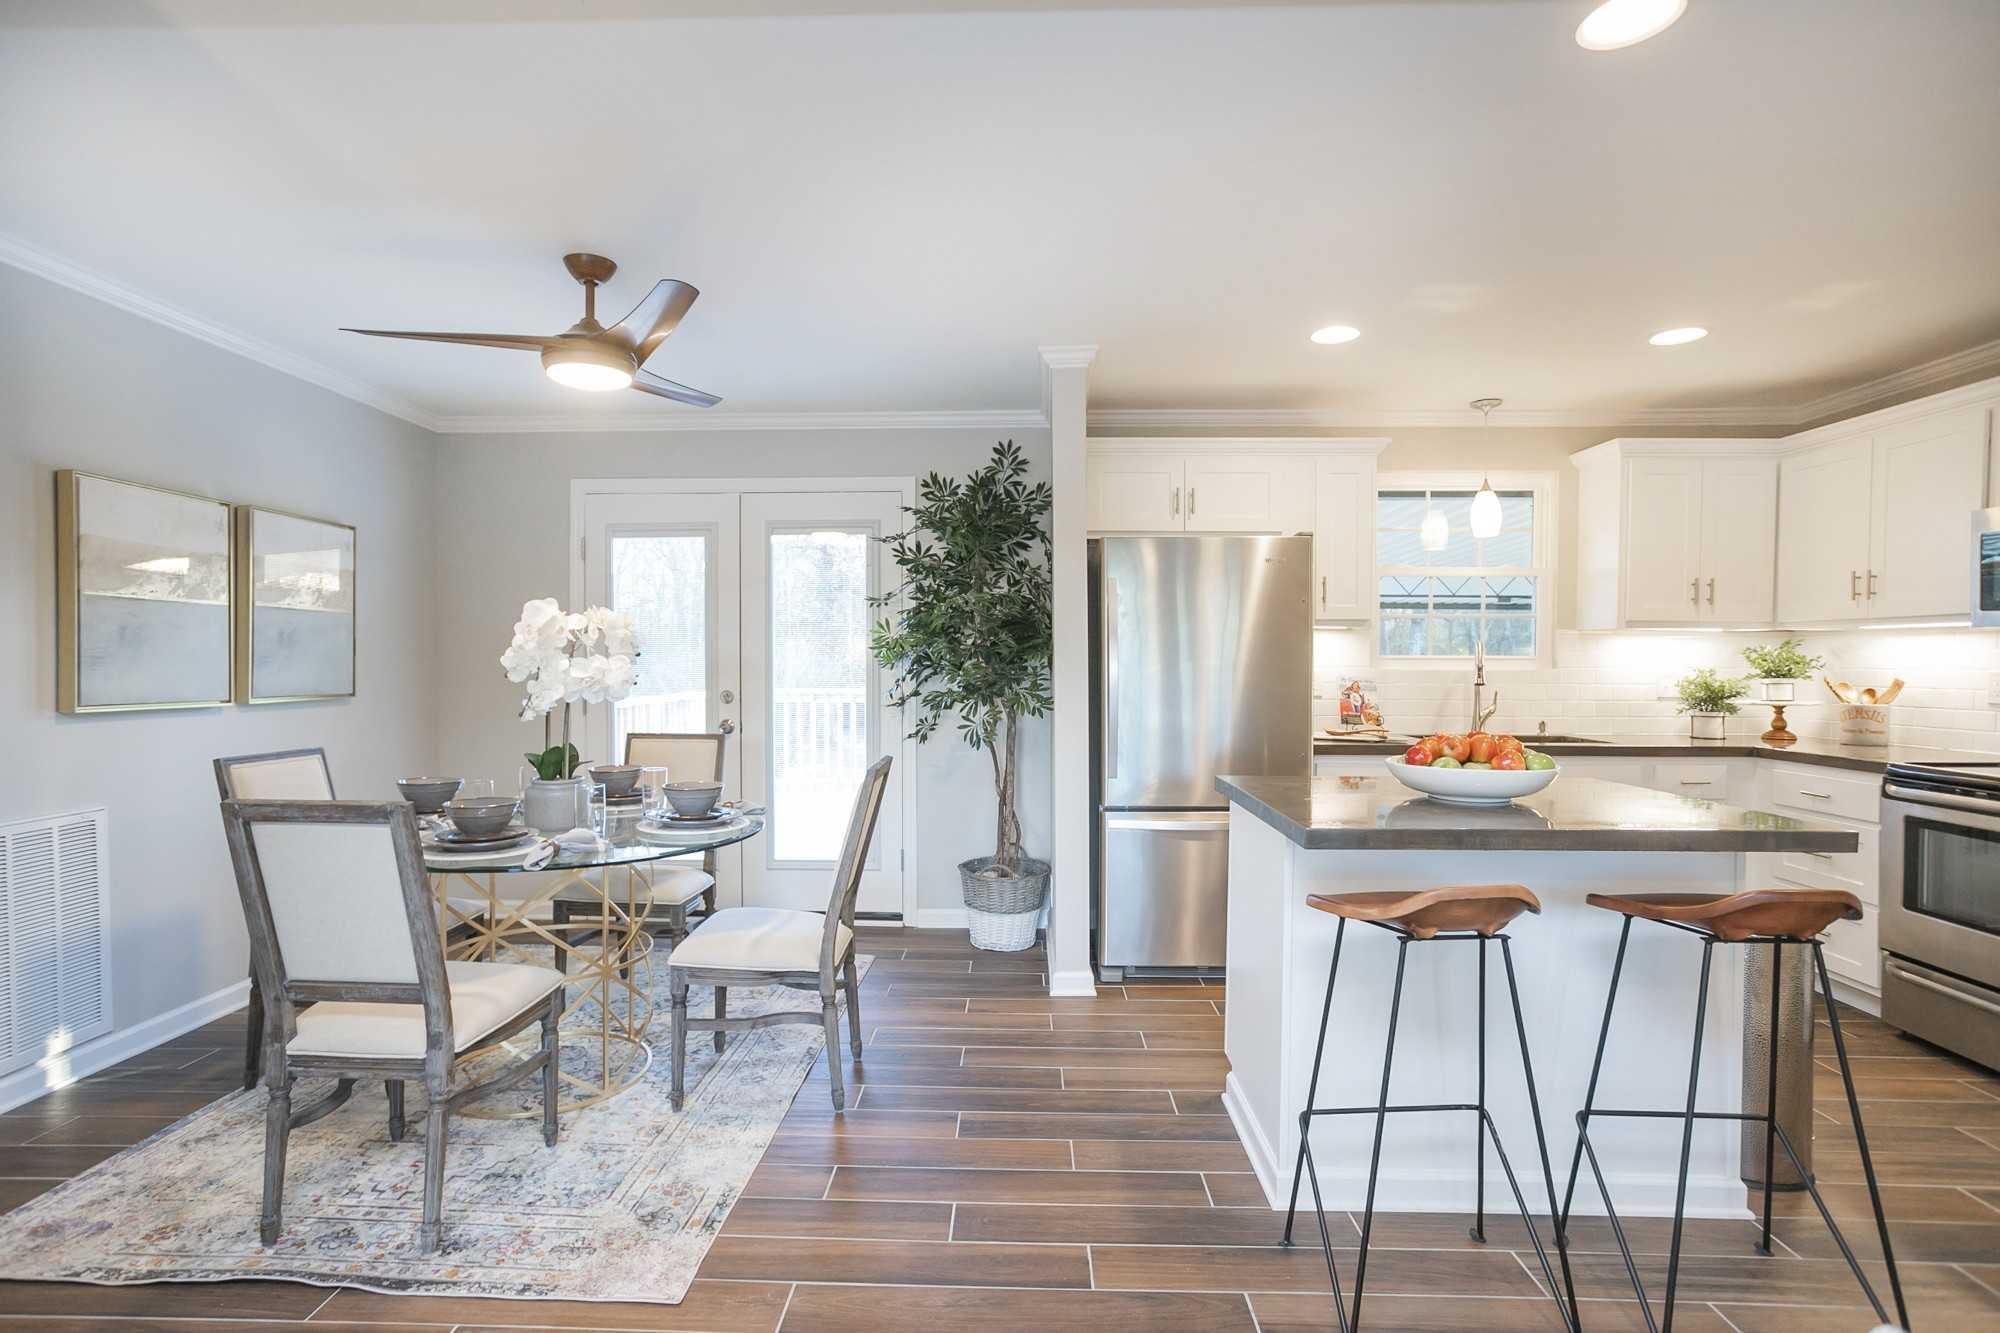 $369,000 - 4Br/2Ba -  for Sale in Primrose Acres, Madison